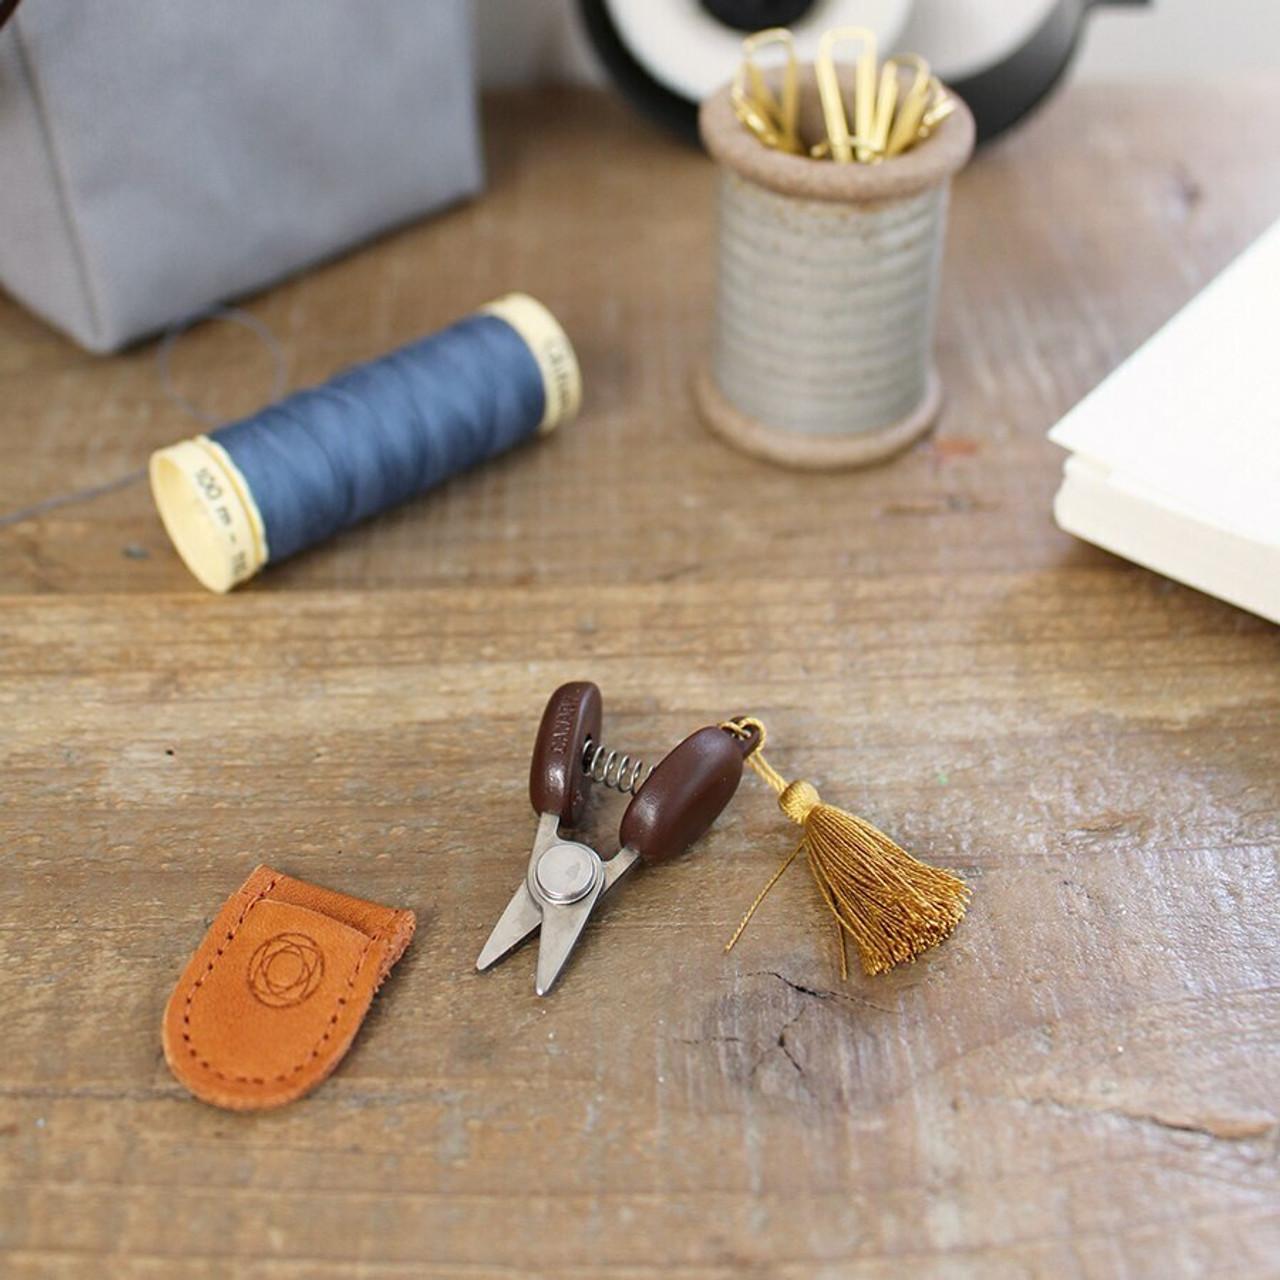 Cohana Mini Scissors from Seiki